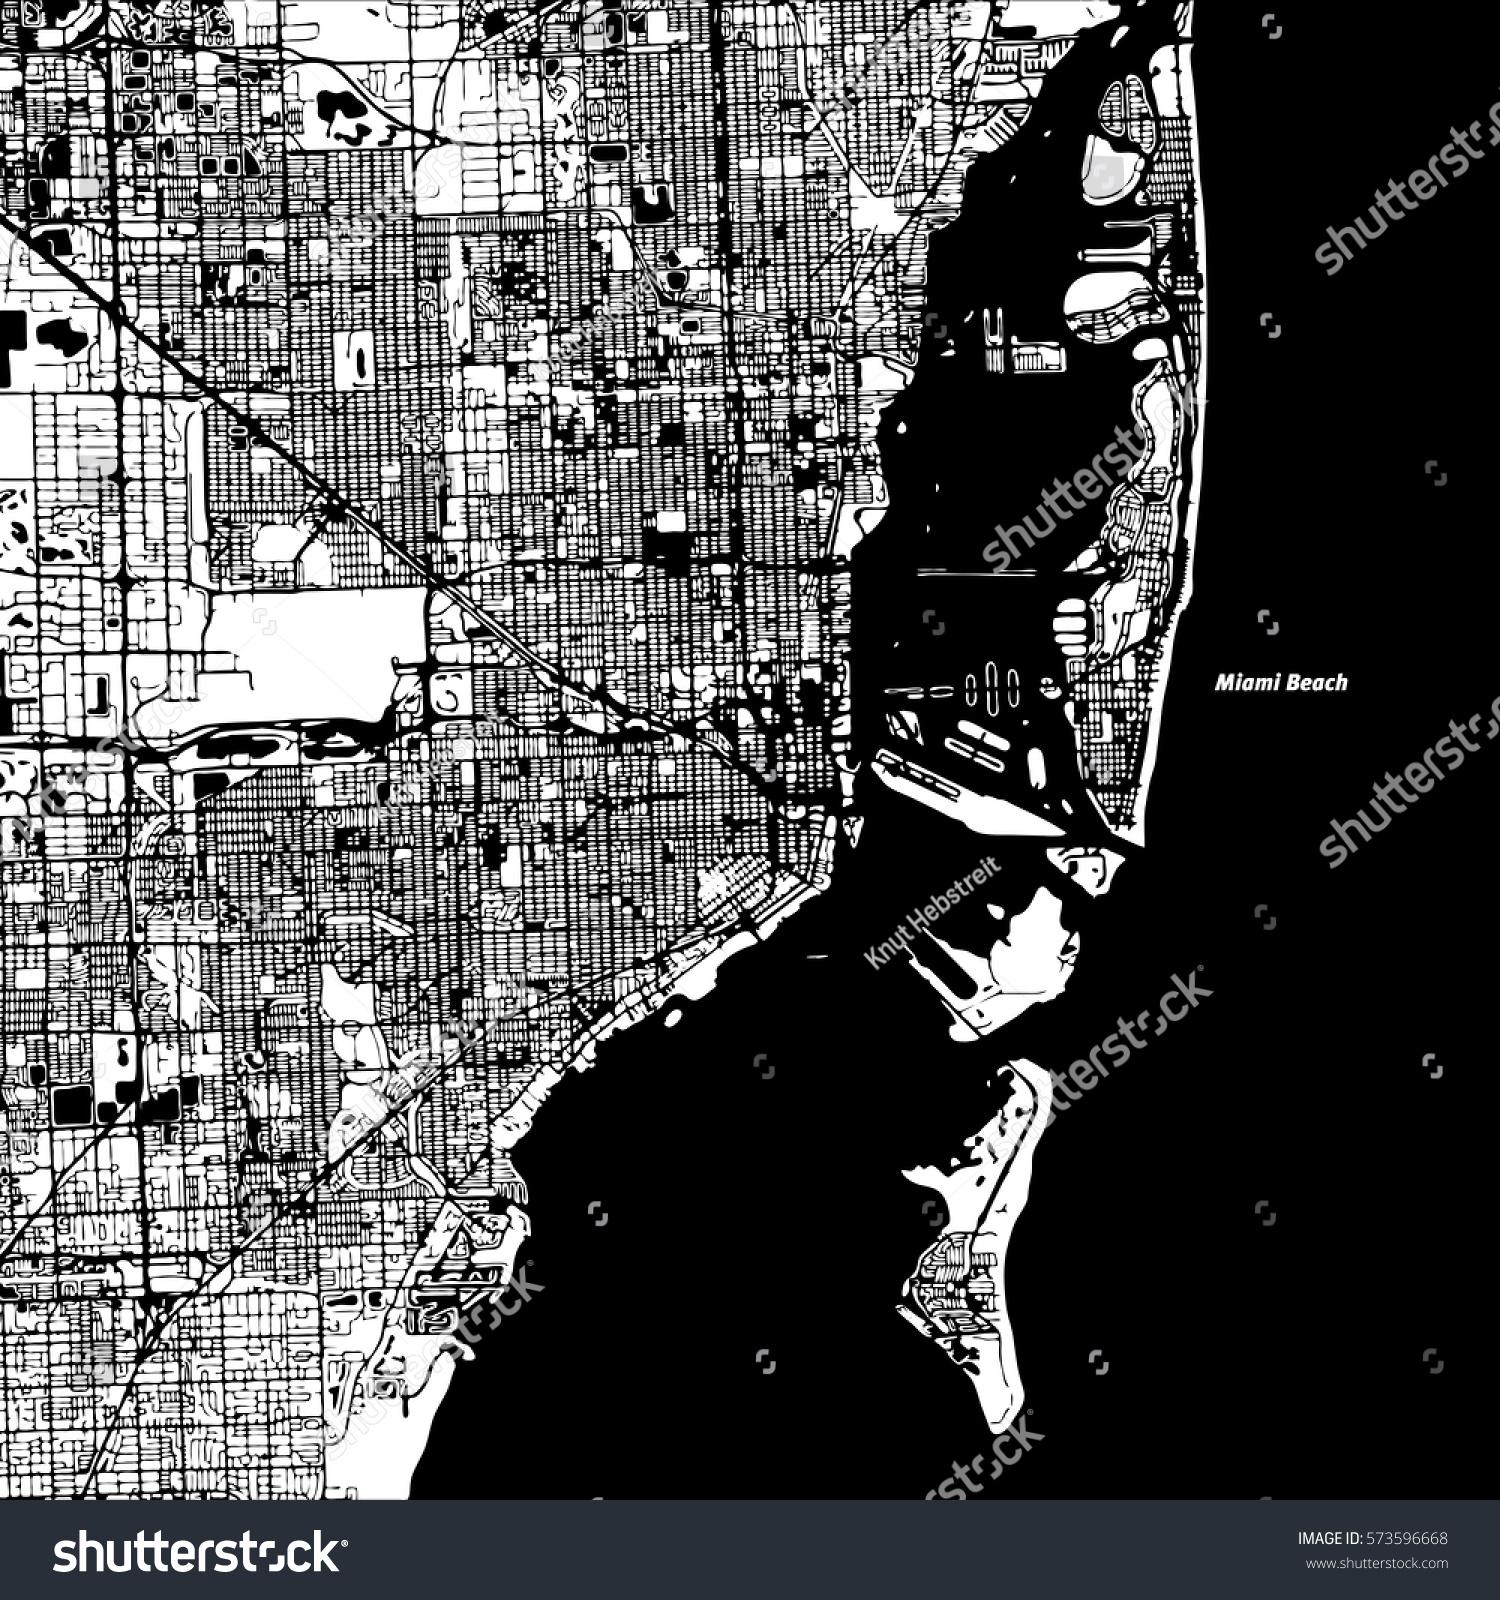 miami and miami beach vector map, stock-vektorgrafik